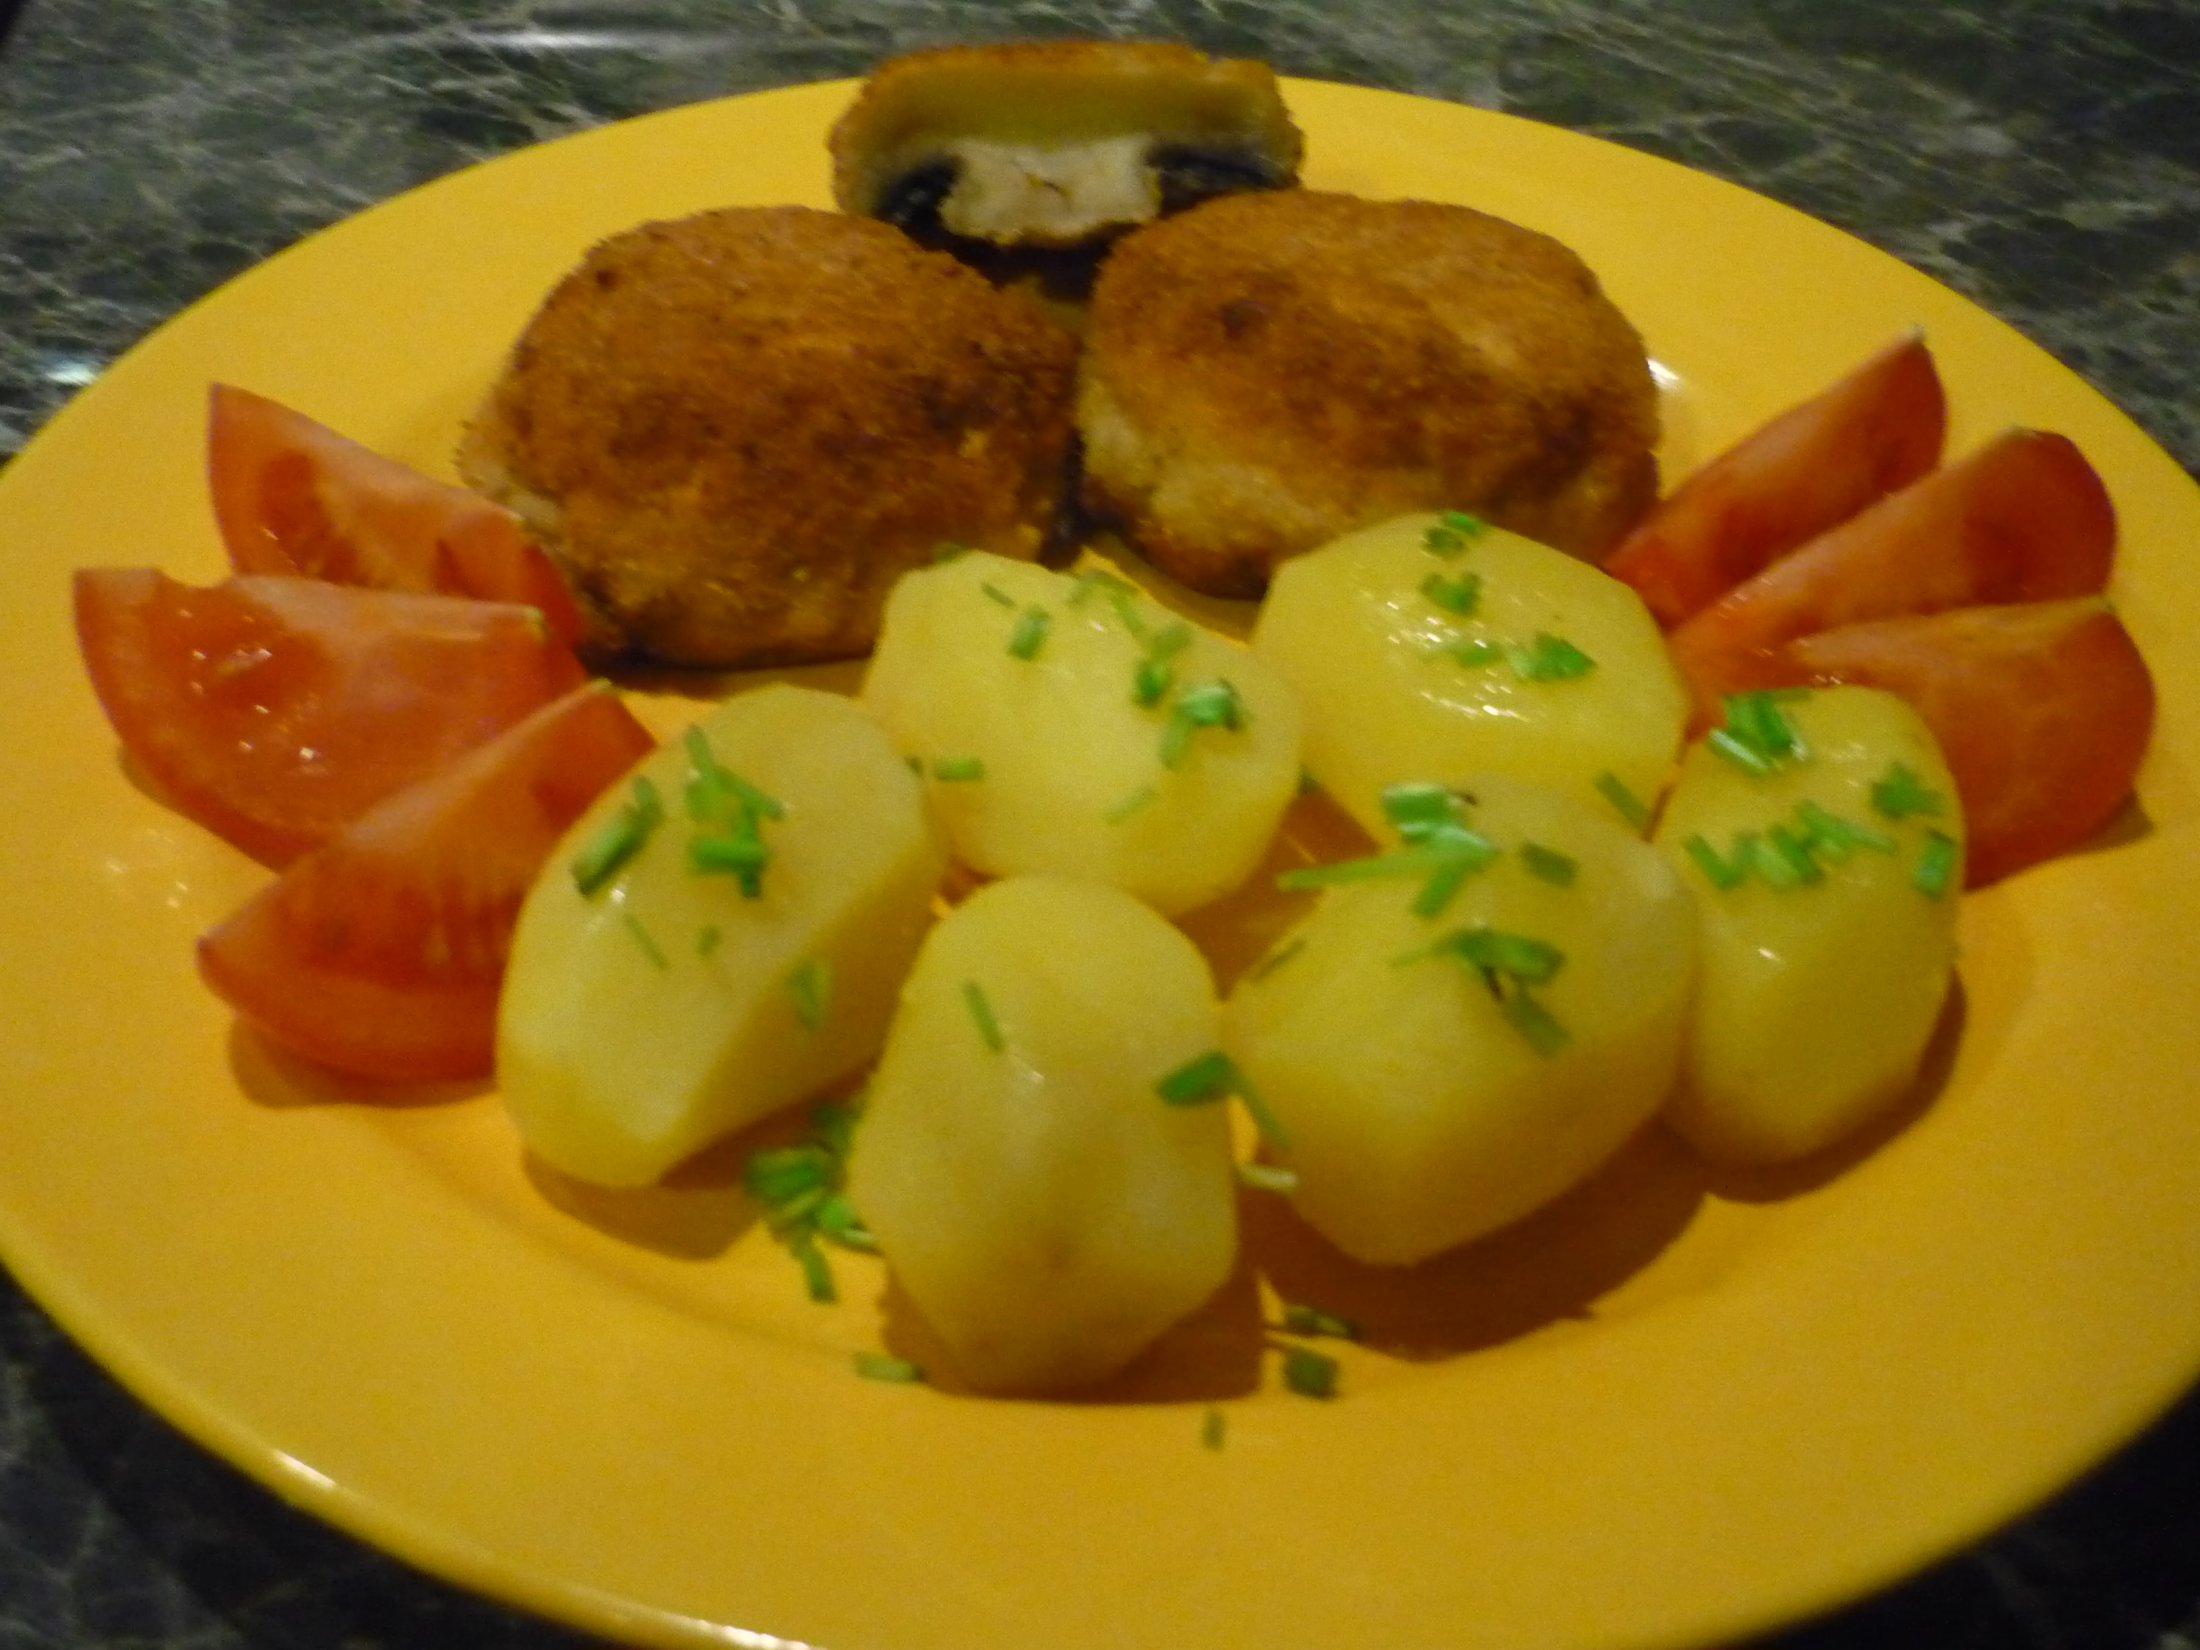 Recept Smažené žampiony - Moje žampiony s bramborem a pažitkou.